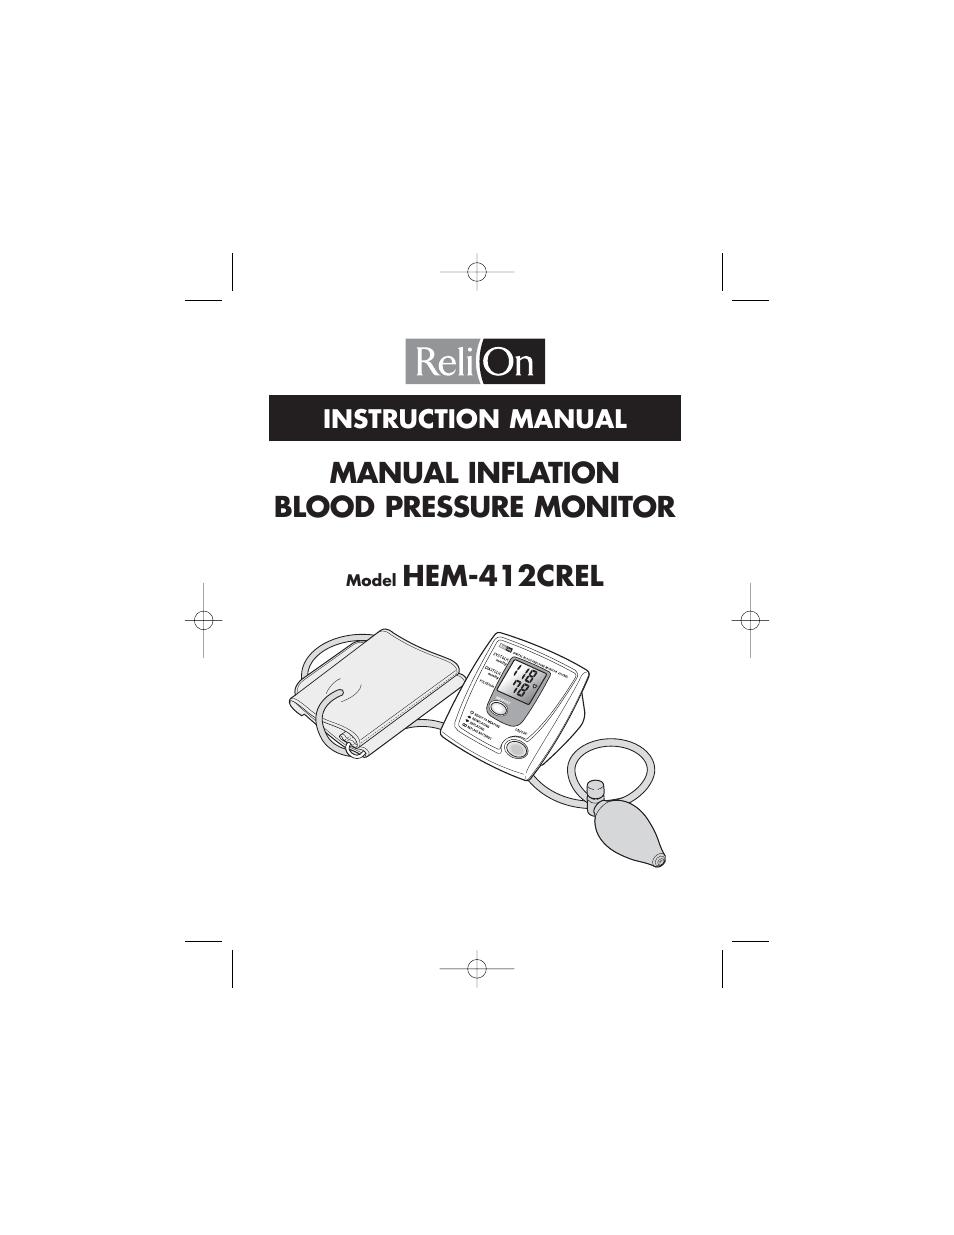 Relion Hem 412crel User Manual 24 Pages